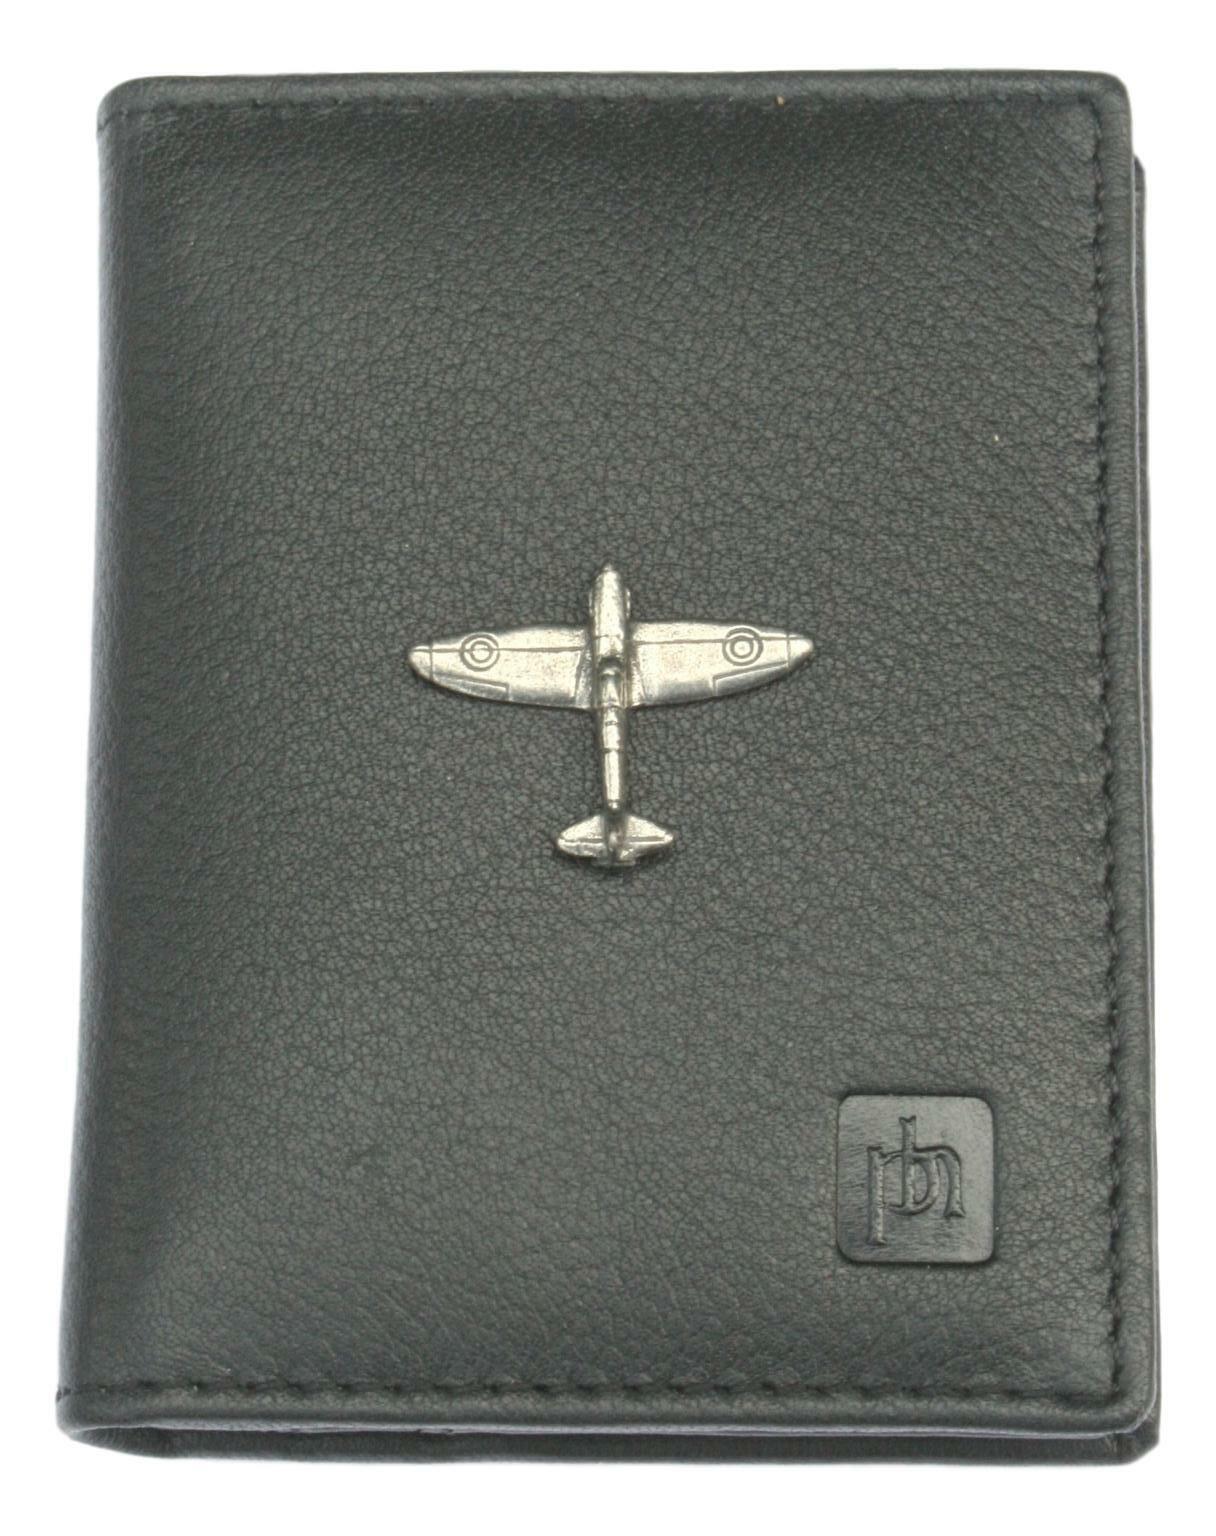 Spitfire doble pliegue soporte tarjeta cartera De Cuero Negro RFID Safe 342